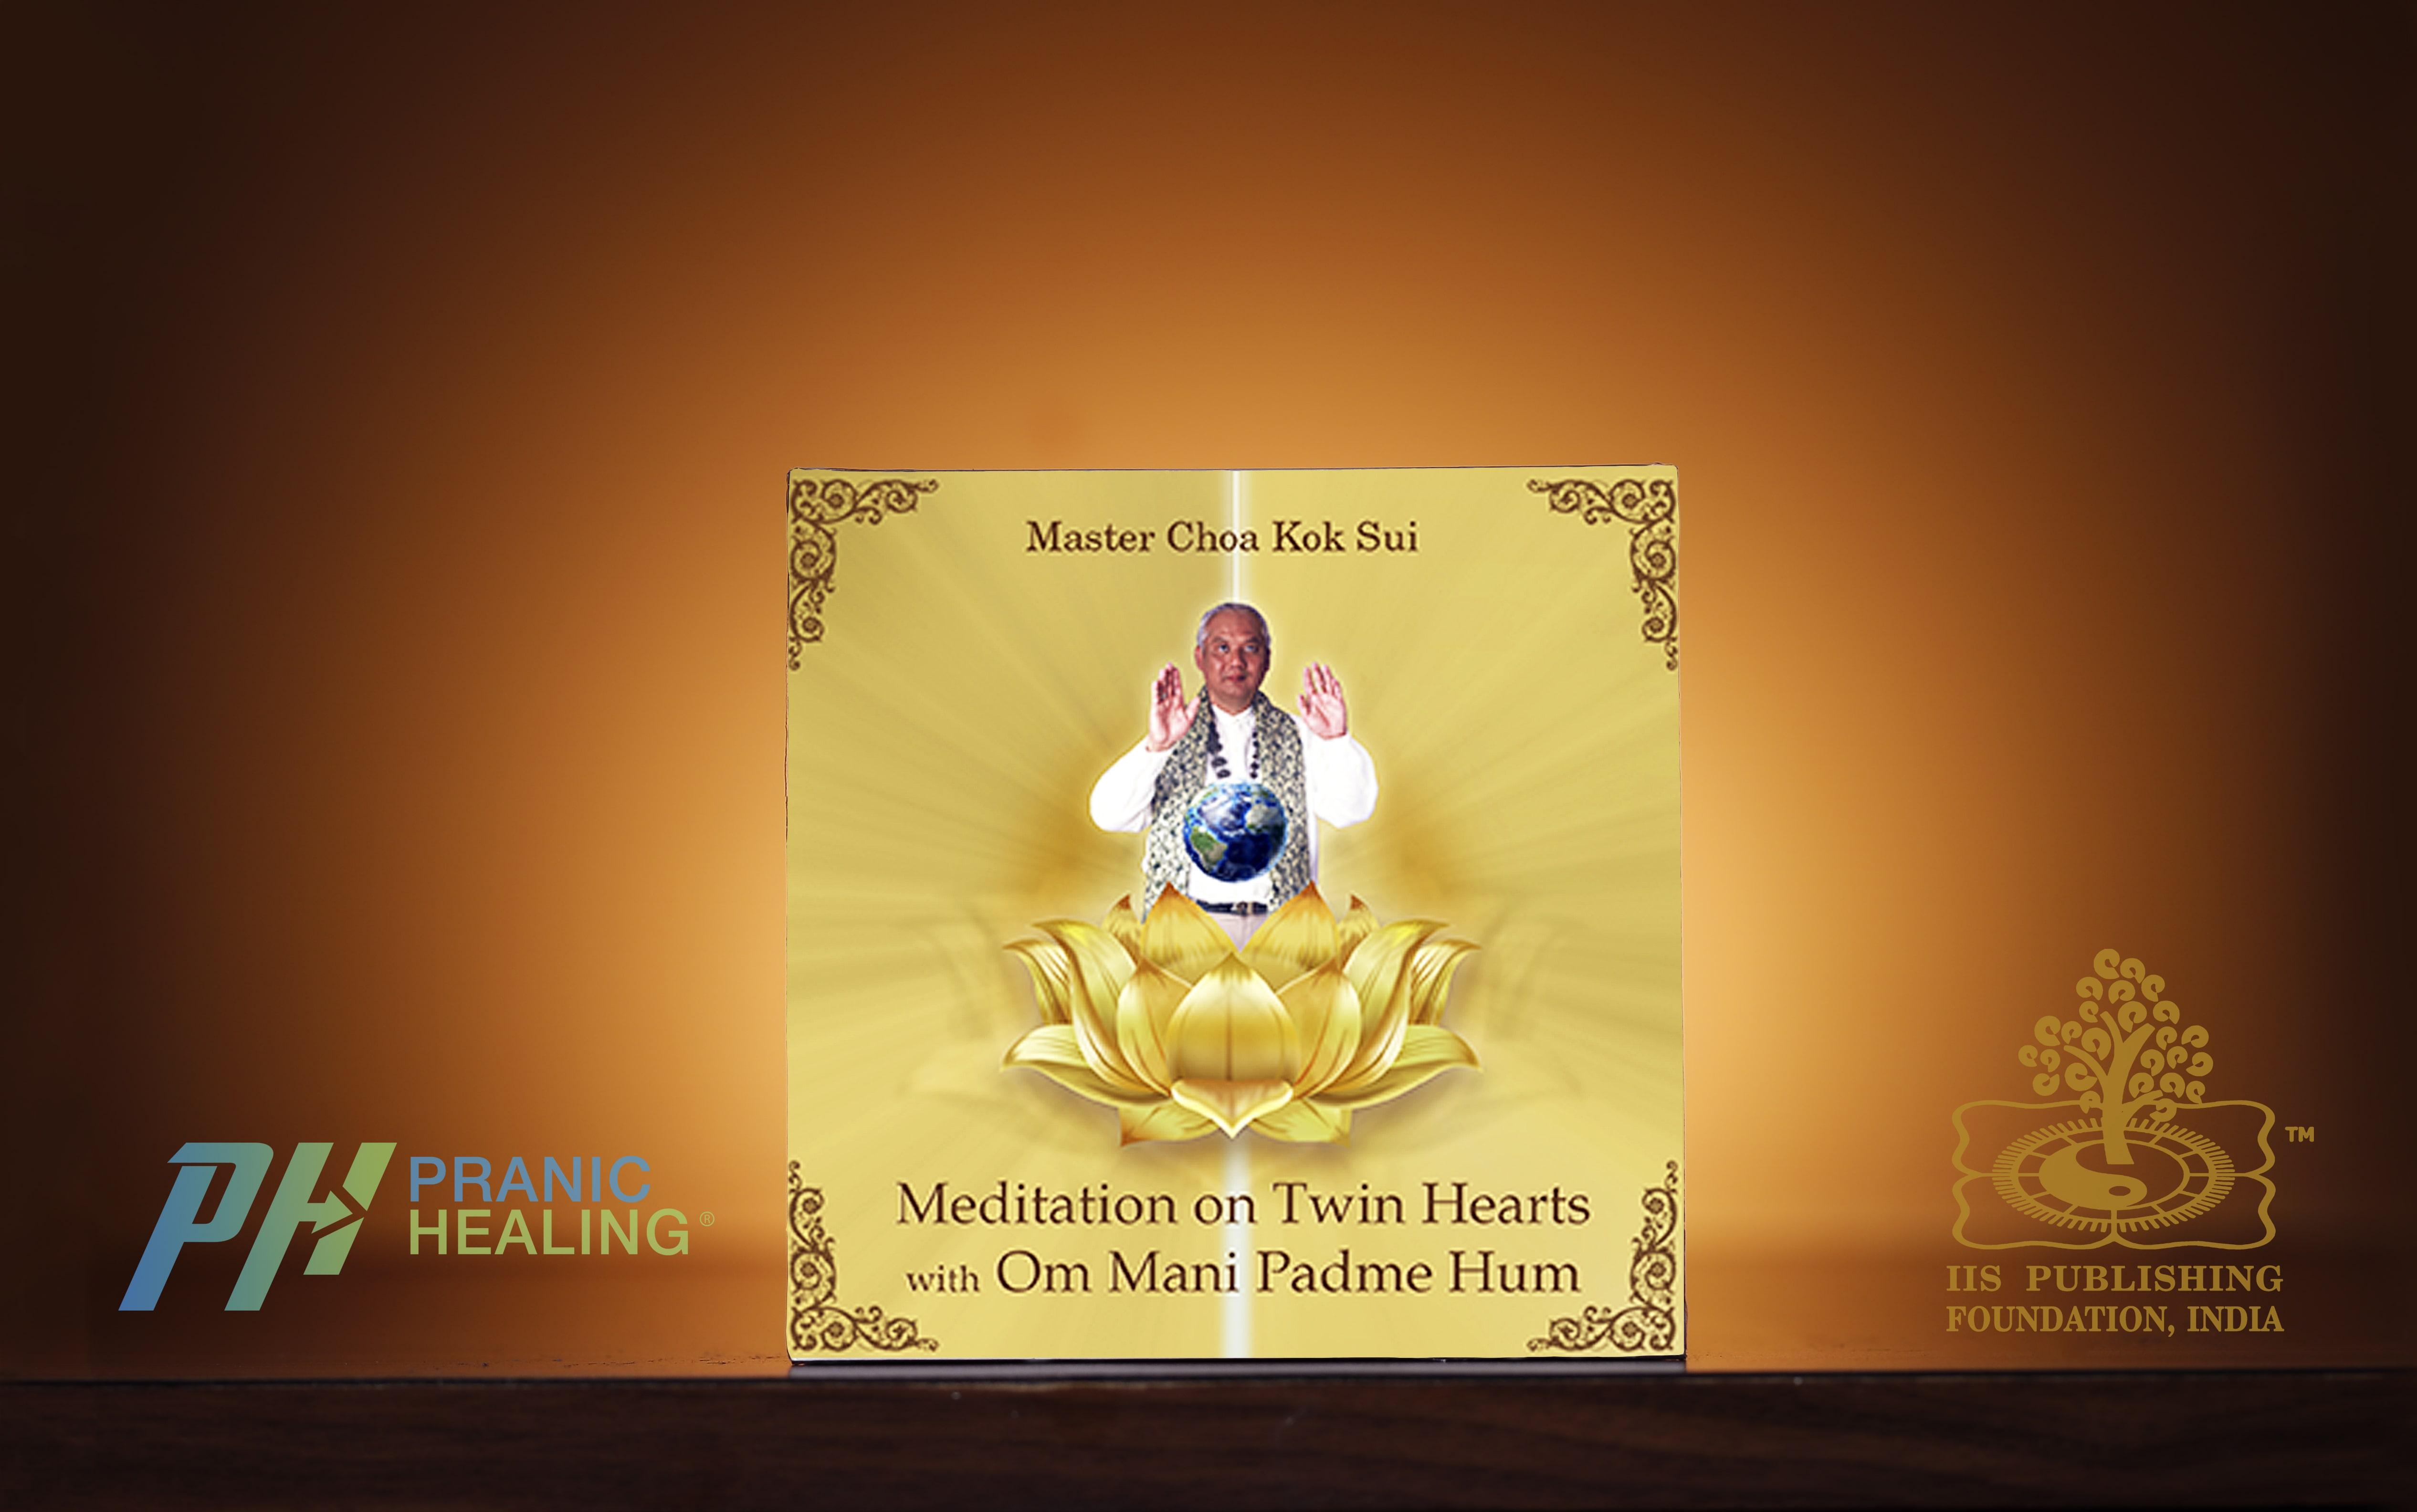 https://shop.pranichealingmumbai.com/products/om-mani-padme-hum-meditation-cd